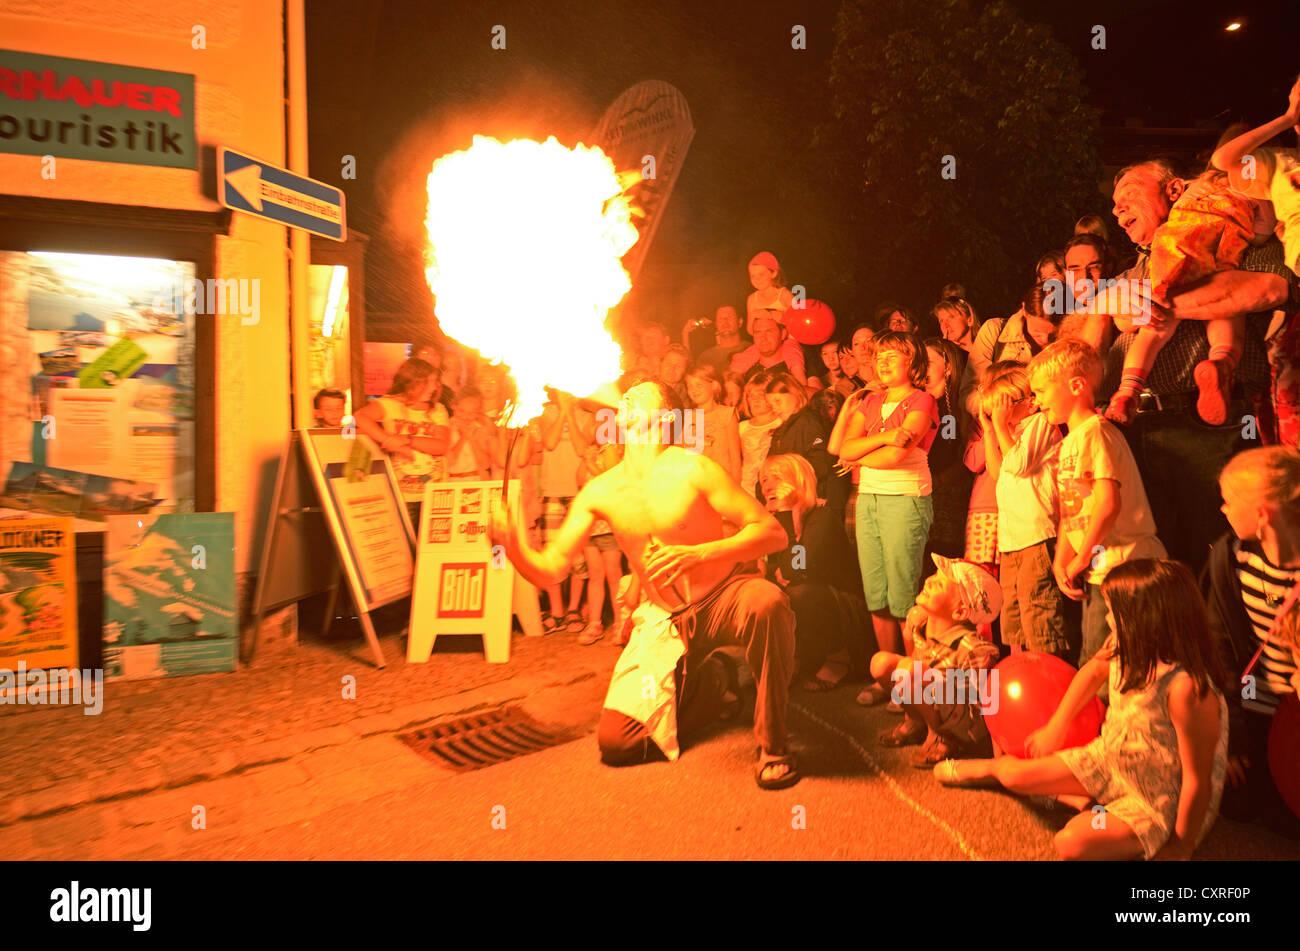 Fire-eater, street festival, Reit im Winkl, Chiemgau, Upper Bavaria, Bavaria, Germany, Europe - Stock Image